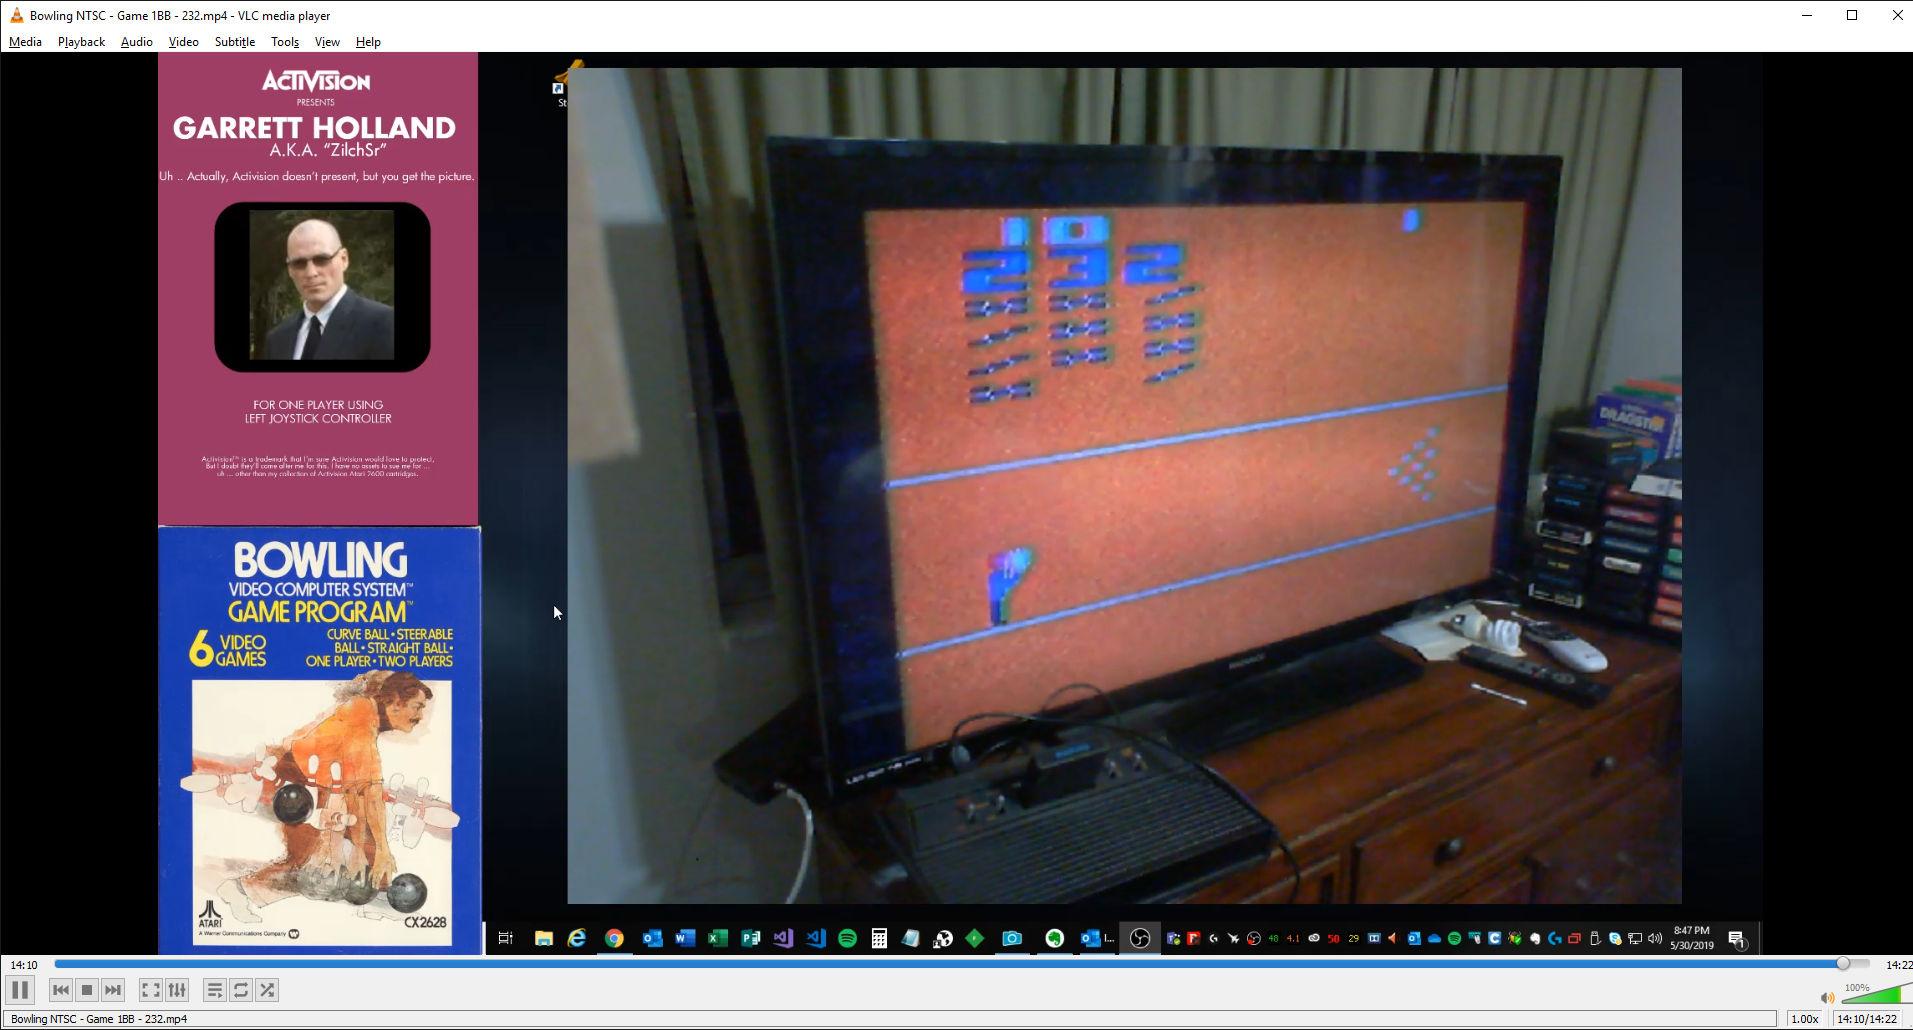 ZilchSr: Bowling (Atari 2600 Novice/B) 232 points on 2019-05-30 21:40:34